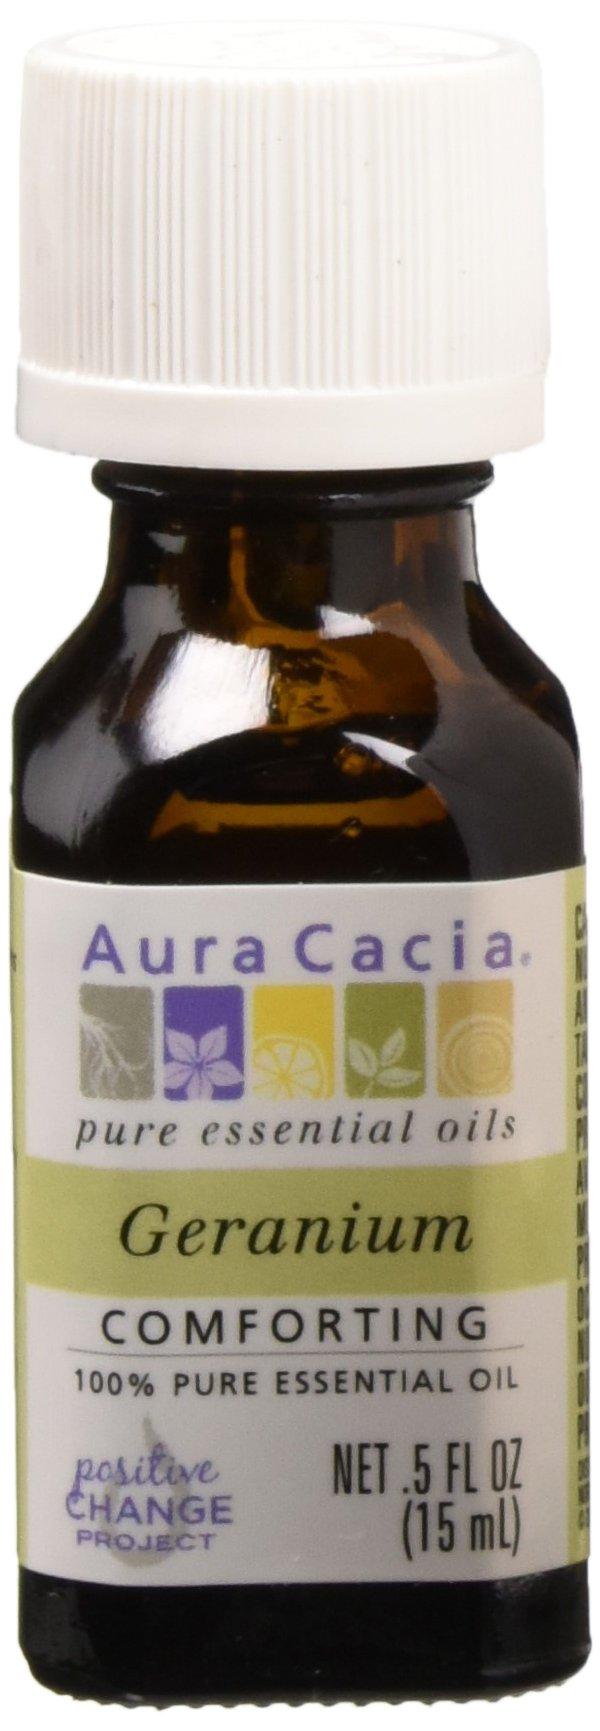 Aura Cacia - Essential Oil, Geranium, 0.5 oz